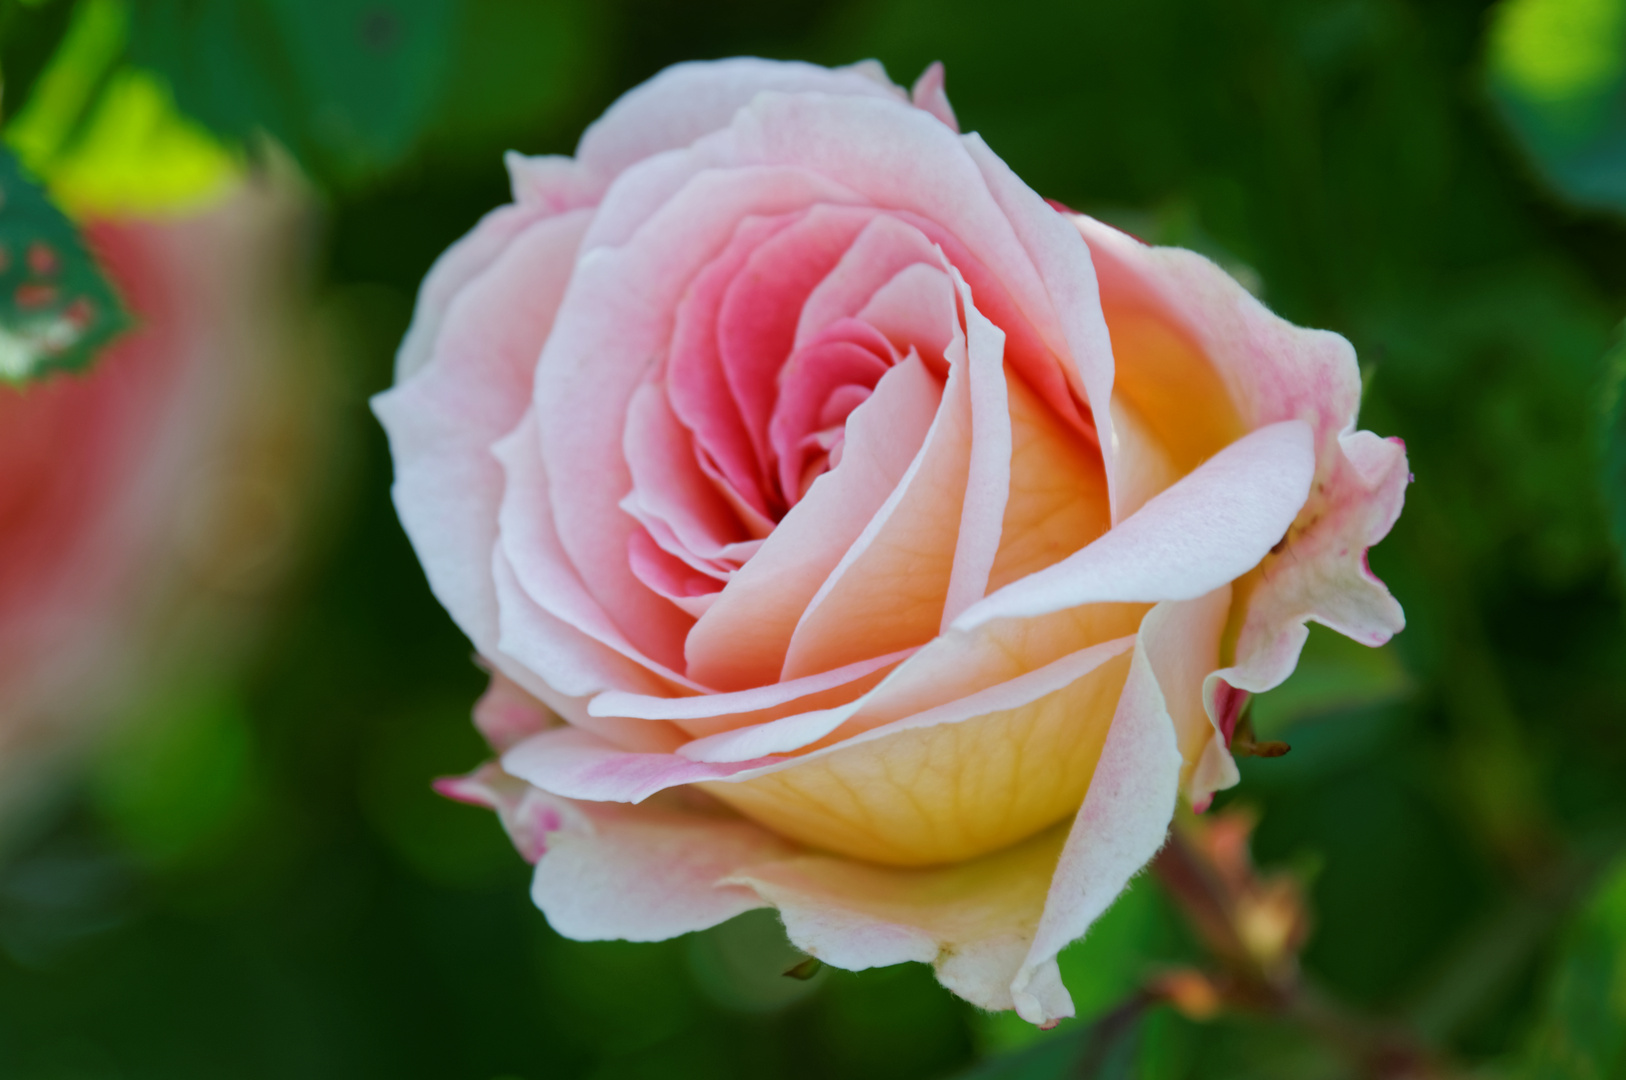 ich liebe rosen foto bild pflanzen pilze flechten bl ten kleinpflanzen rosen. Black Bedroom Furniture Sets. Home Design Ideas